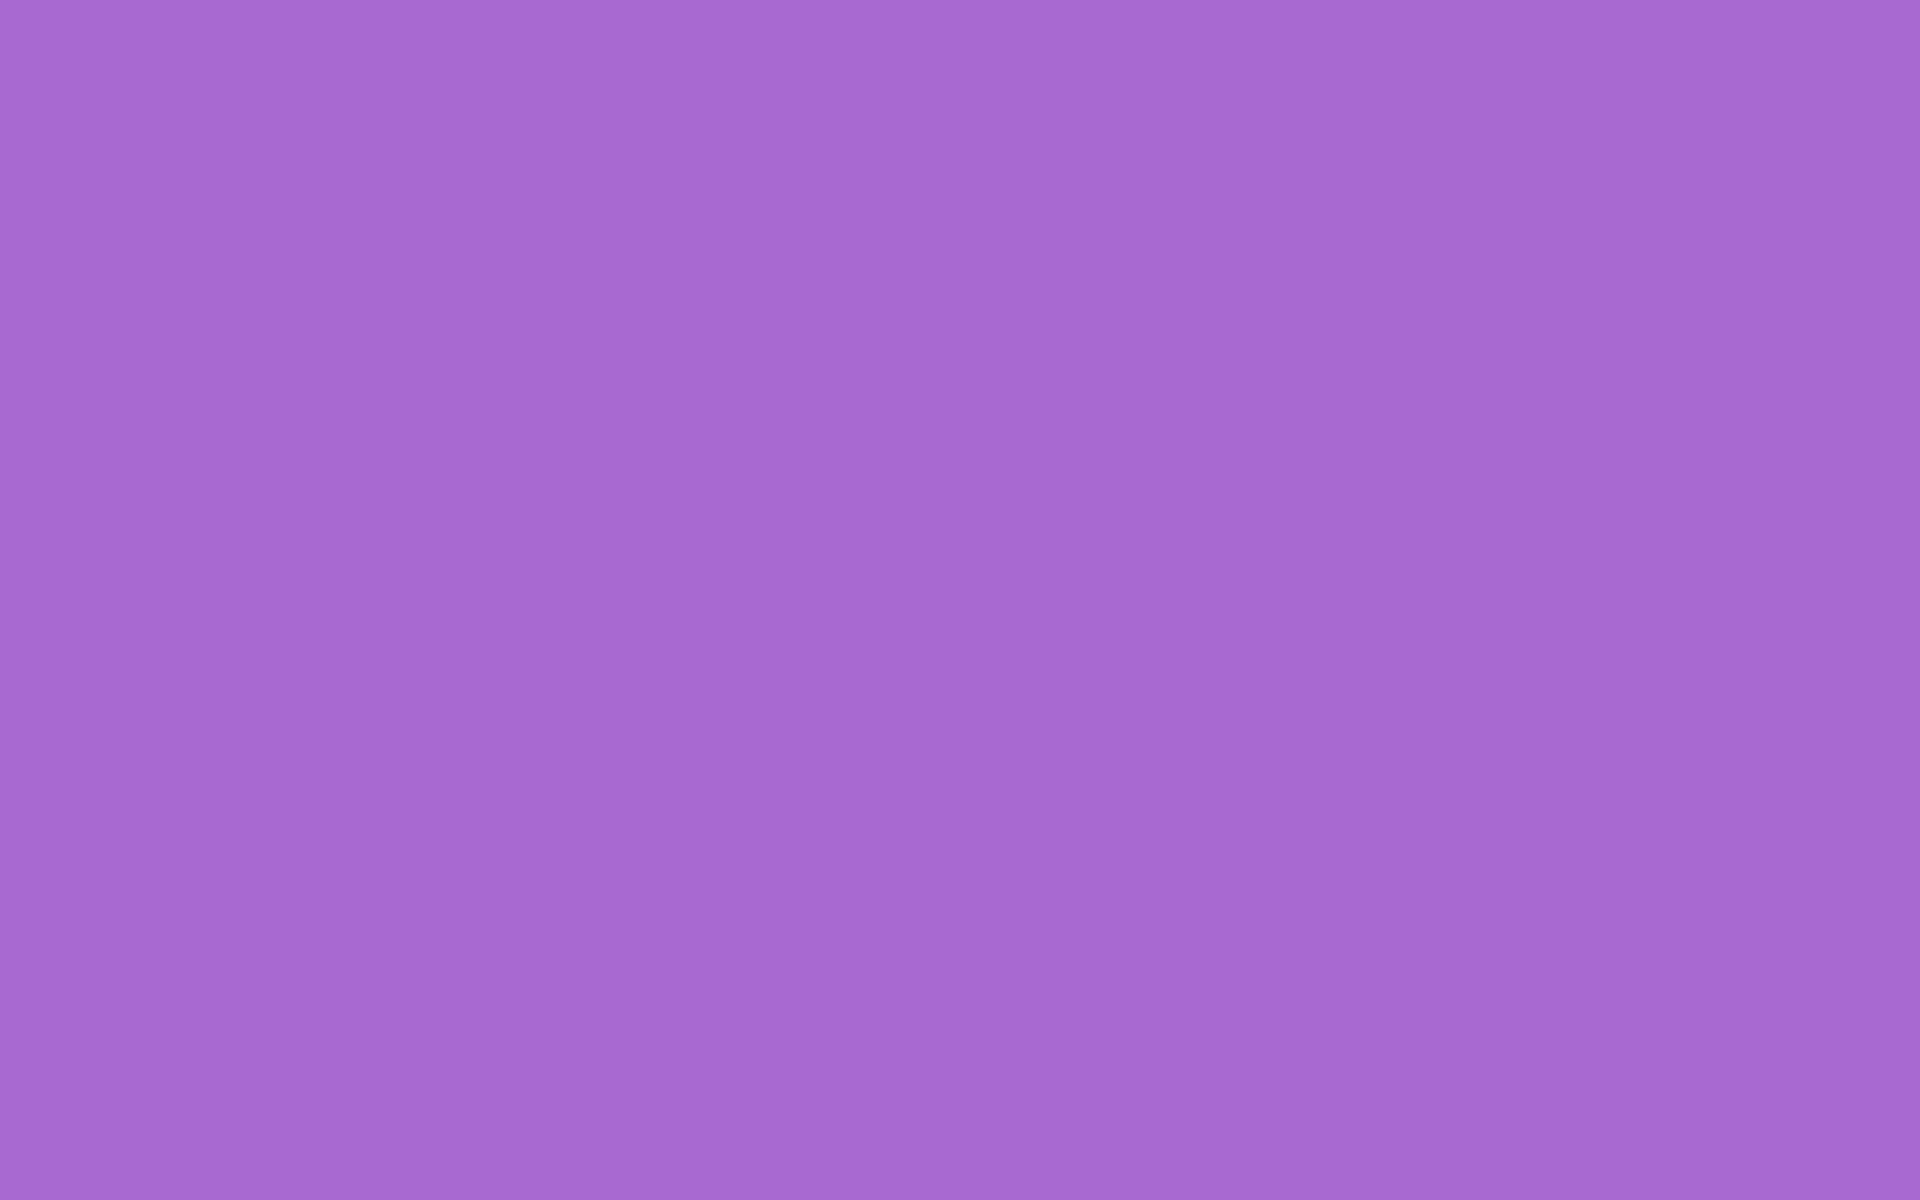 1920x1200 Rich Lavender Solid Color Background